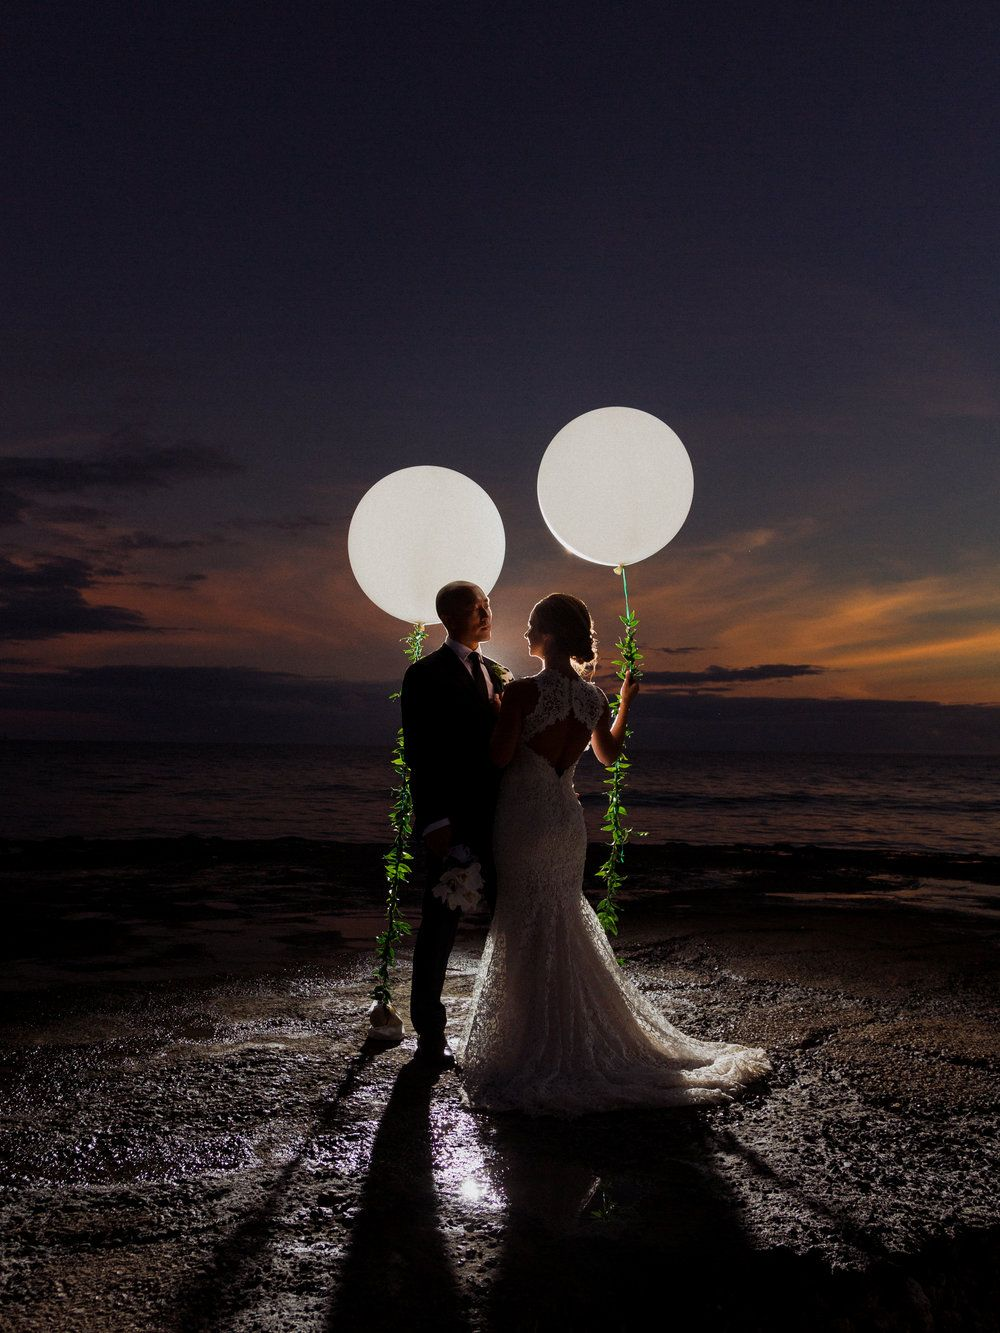 Night Wedding Photos Sunset Wedding Photos Night Wedding Photos Night Beach Weddings